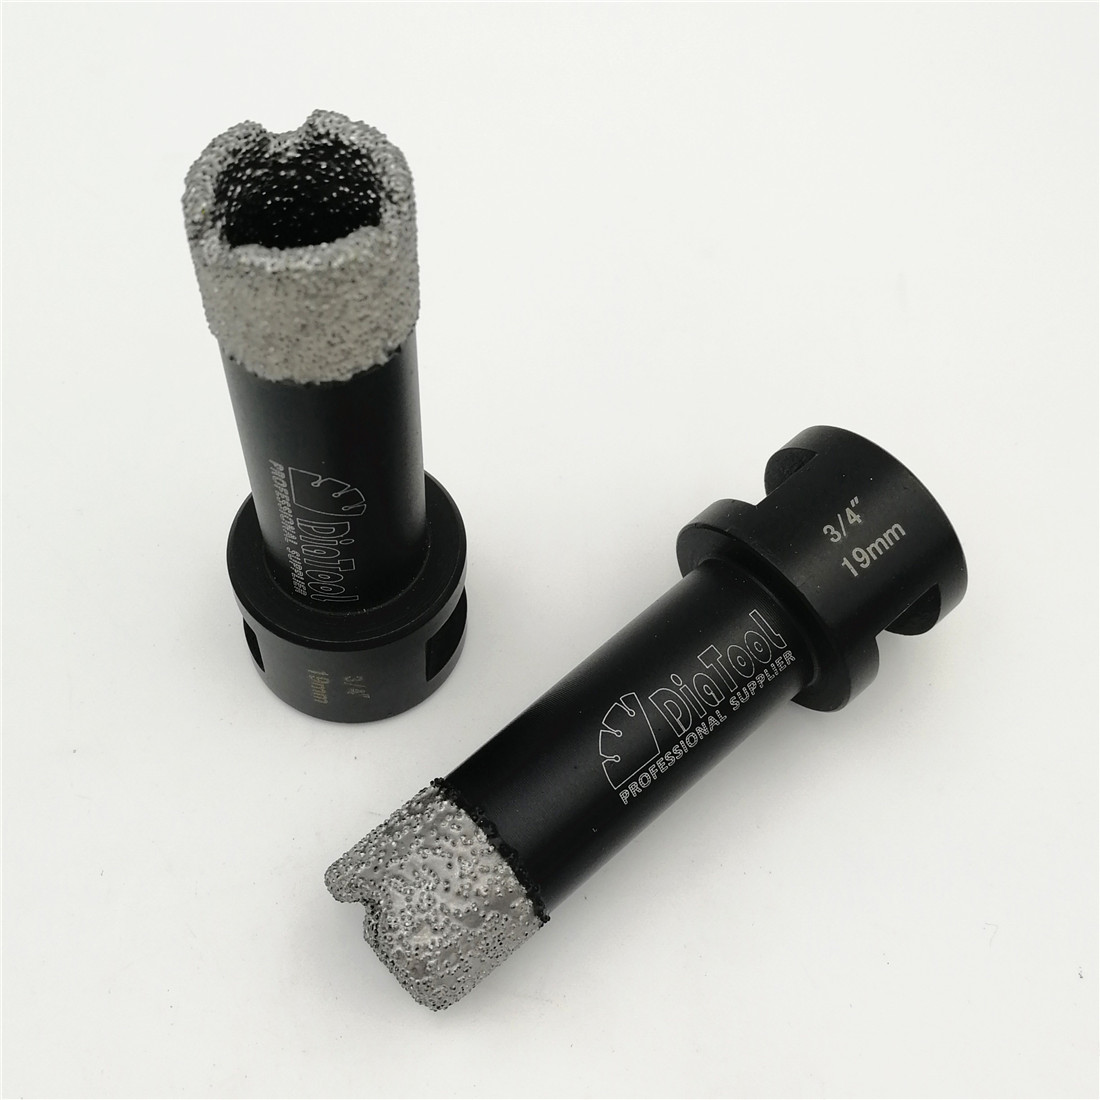 DIATOOL 2pcs 3/4 Vacuum brazed diamond Dry drilling bits 19mm with 5/8-11 connection porcelain tile marble stone Masonry brick diatool 5pcs set vacuum brazed diamond drill core bits with 15mm teeth 20 32 45 55 68mm hole saw granite marble ceramic tile